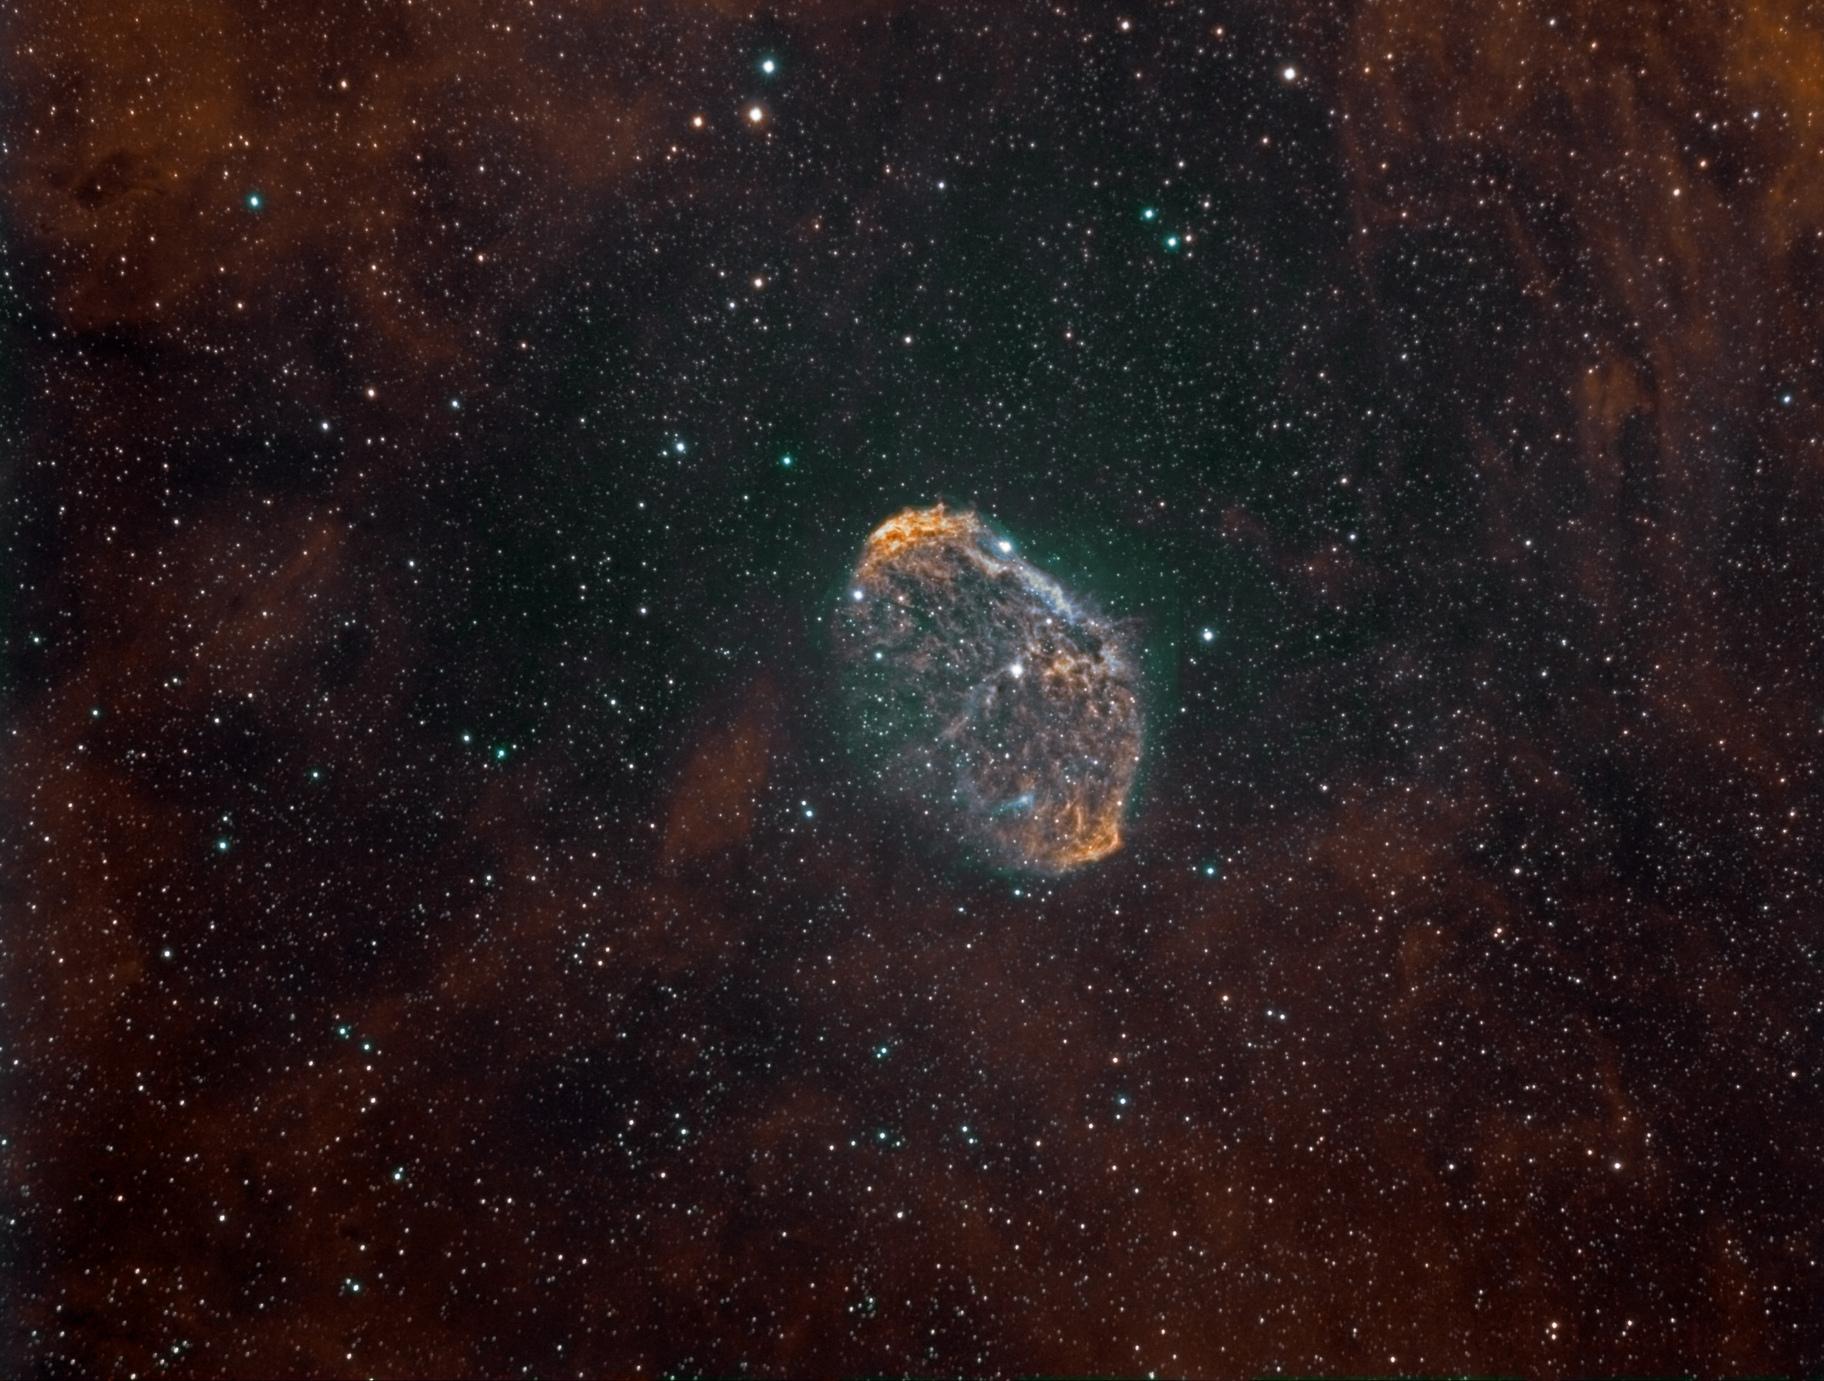 5b03e3349b79f_NGC6888ensho.jpg.f897f11395e52a79109ea5ff4be2f9b2.jpg